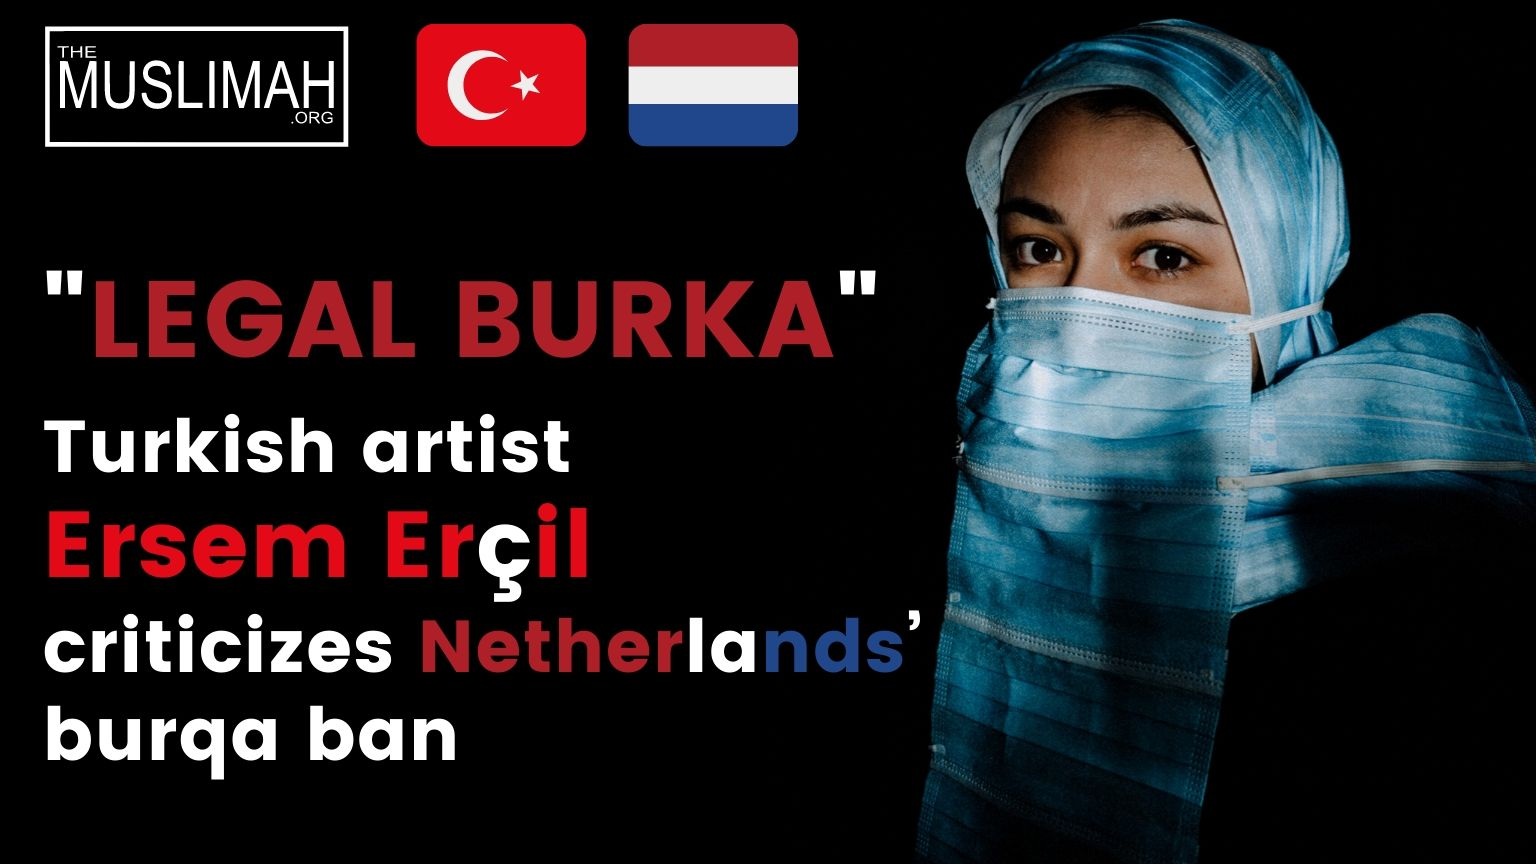 LEGAL BURKA | 🇹🇷 Turkish artist criticizes 🇳🇱 Netherlands' burqa ban 😷